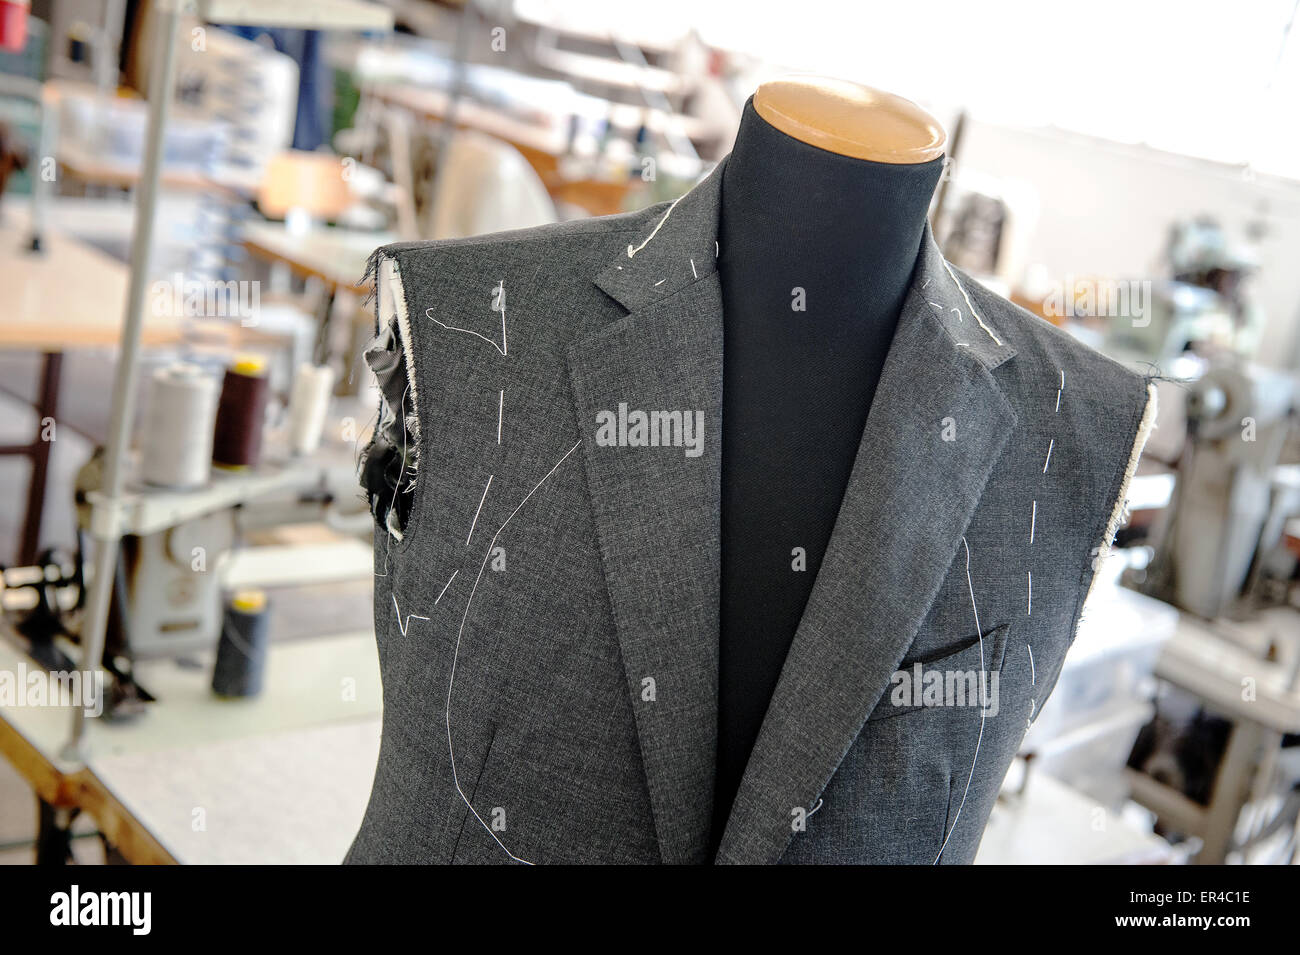 Cerca de Custom made cosidas a mano chaqueta en progreso en Maniqui dentro de fabricación de prendas de vestir Imagen De Stock